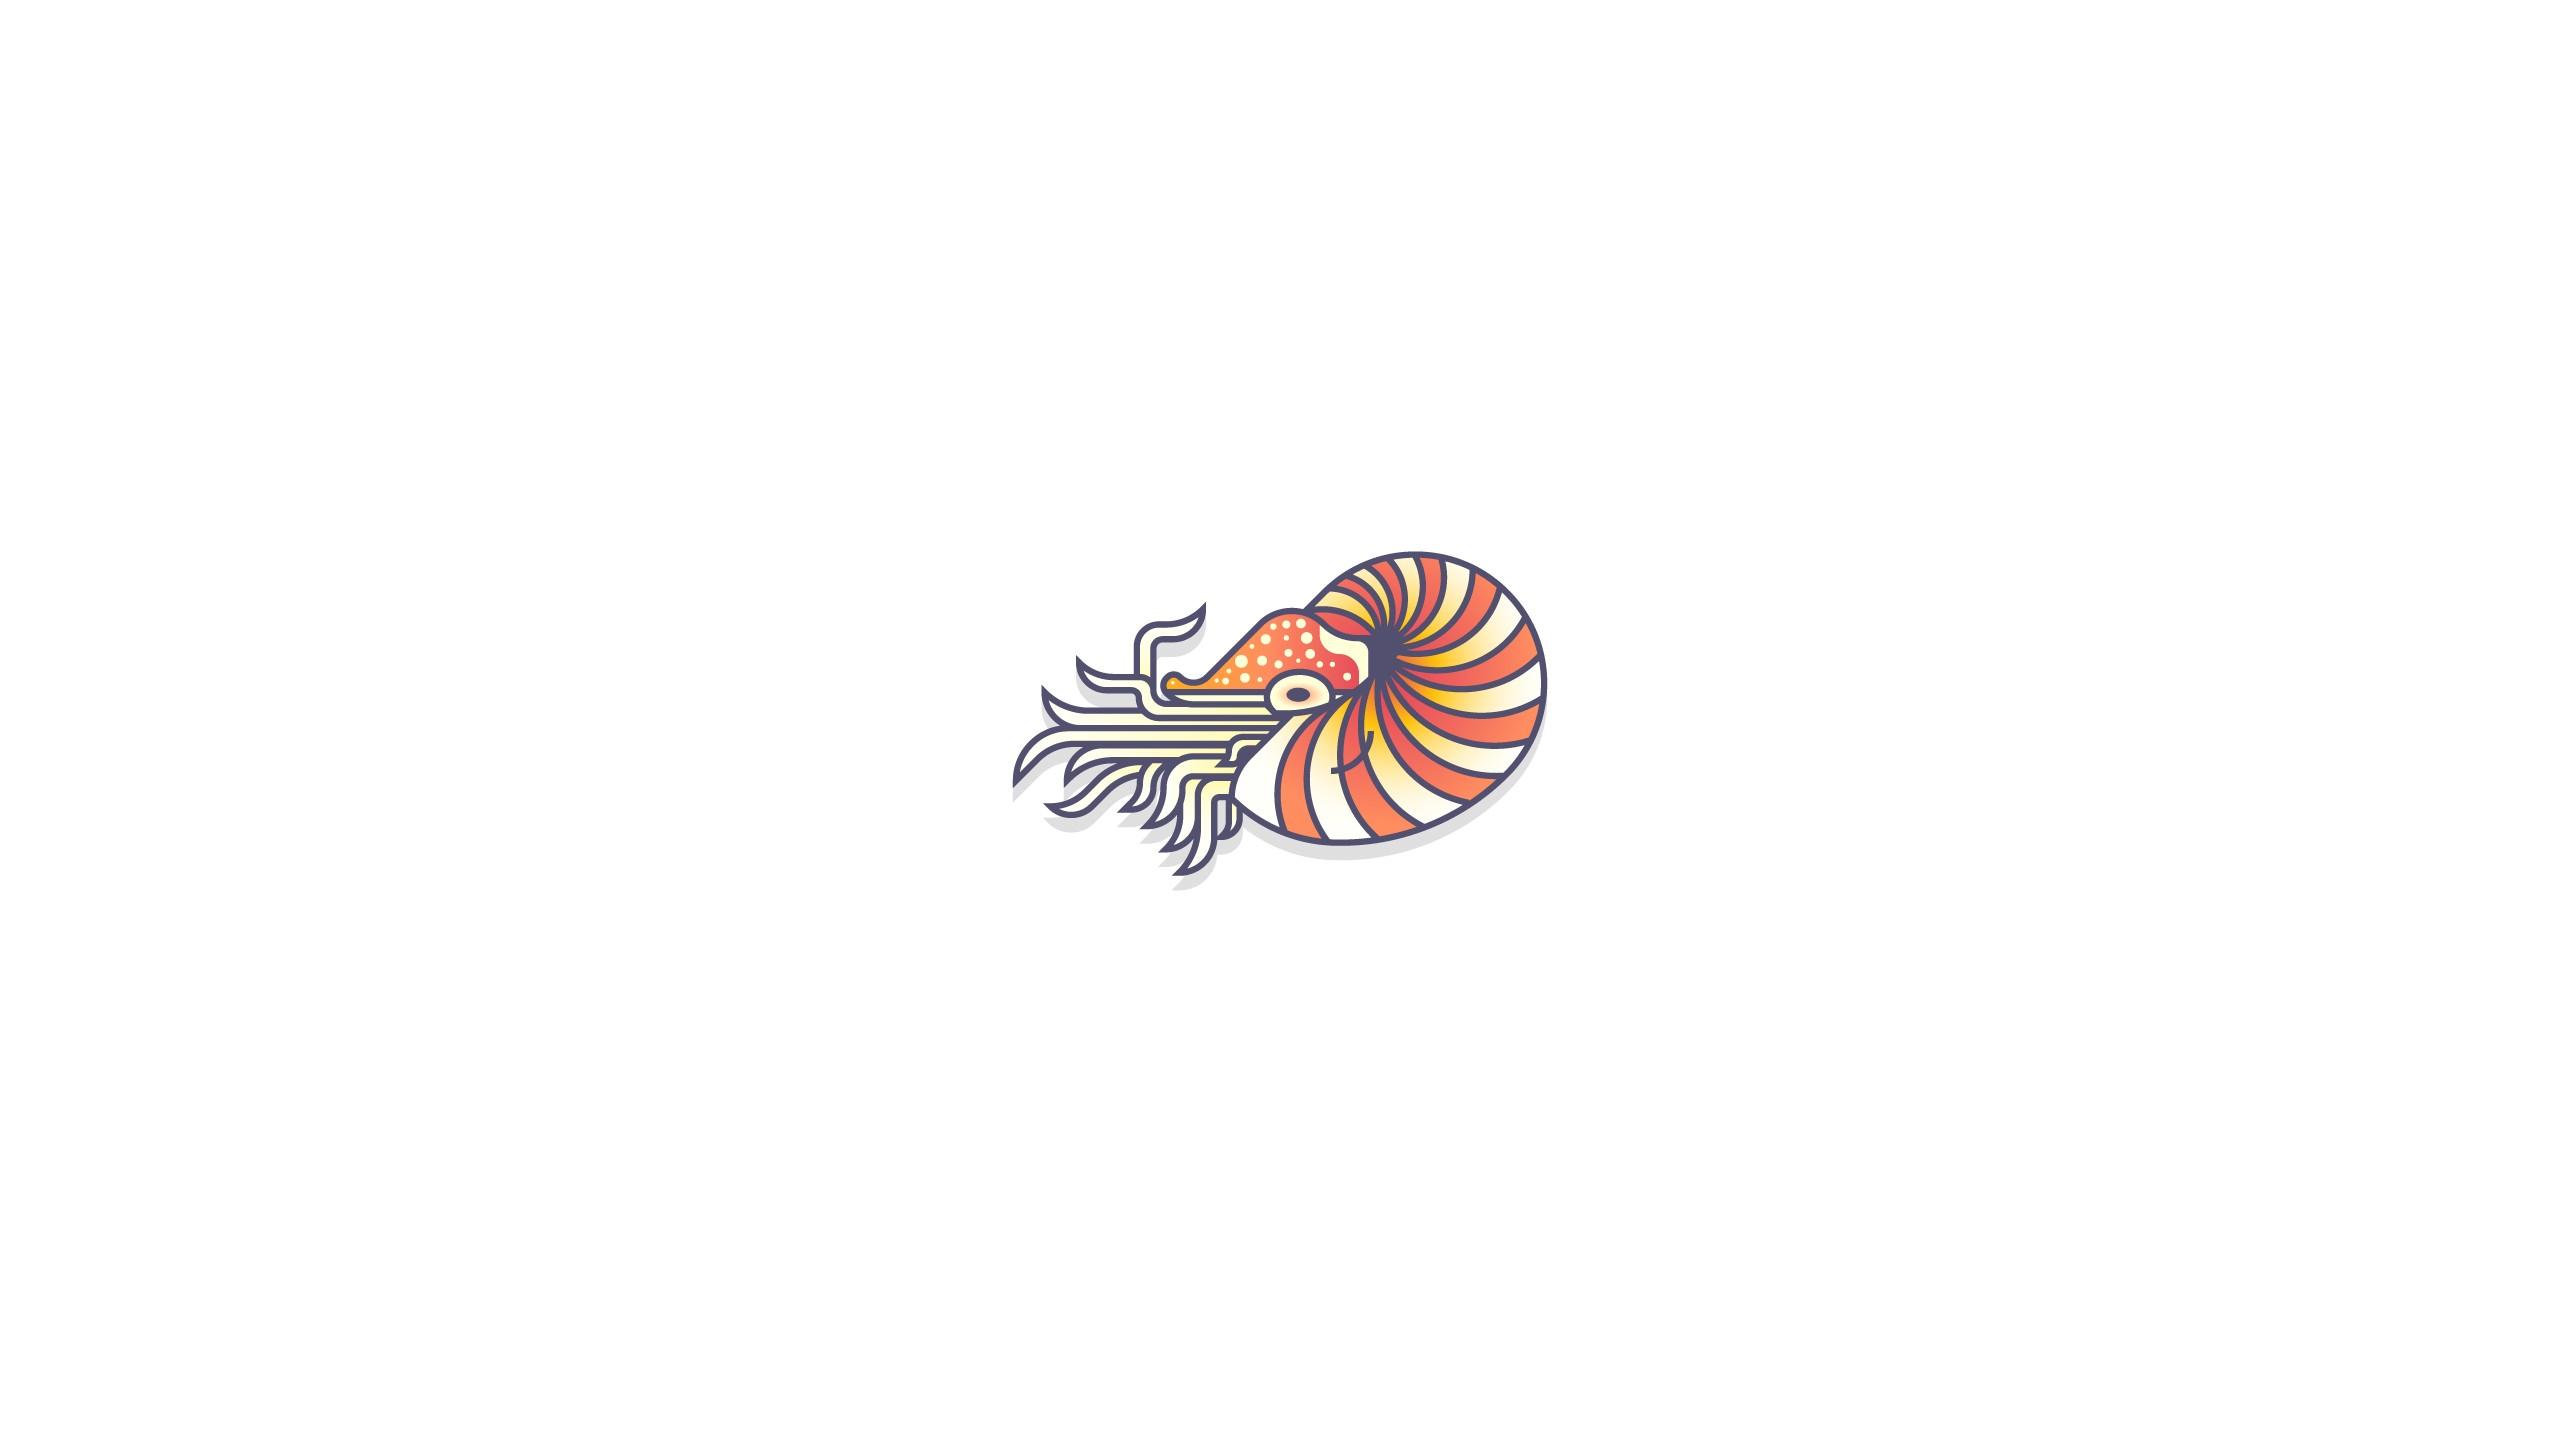 Fond Décran Illustration Fond Blanc Nautile